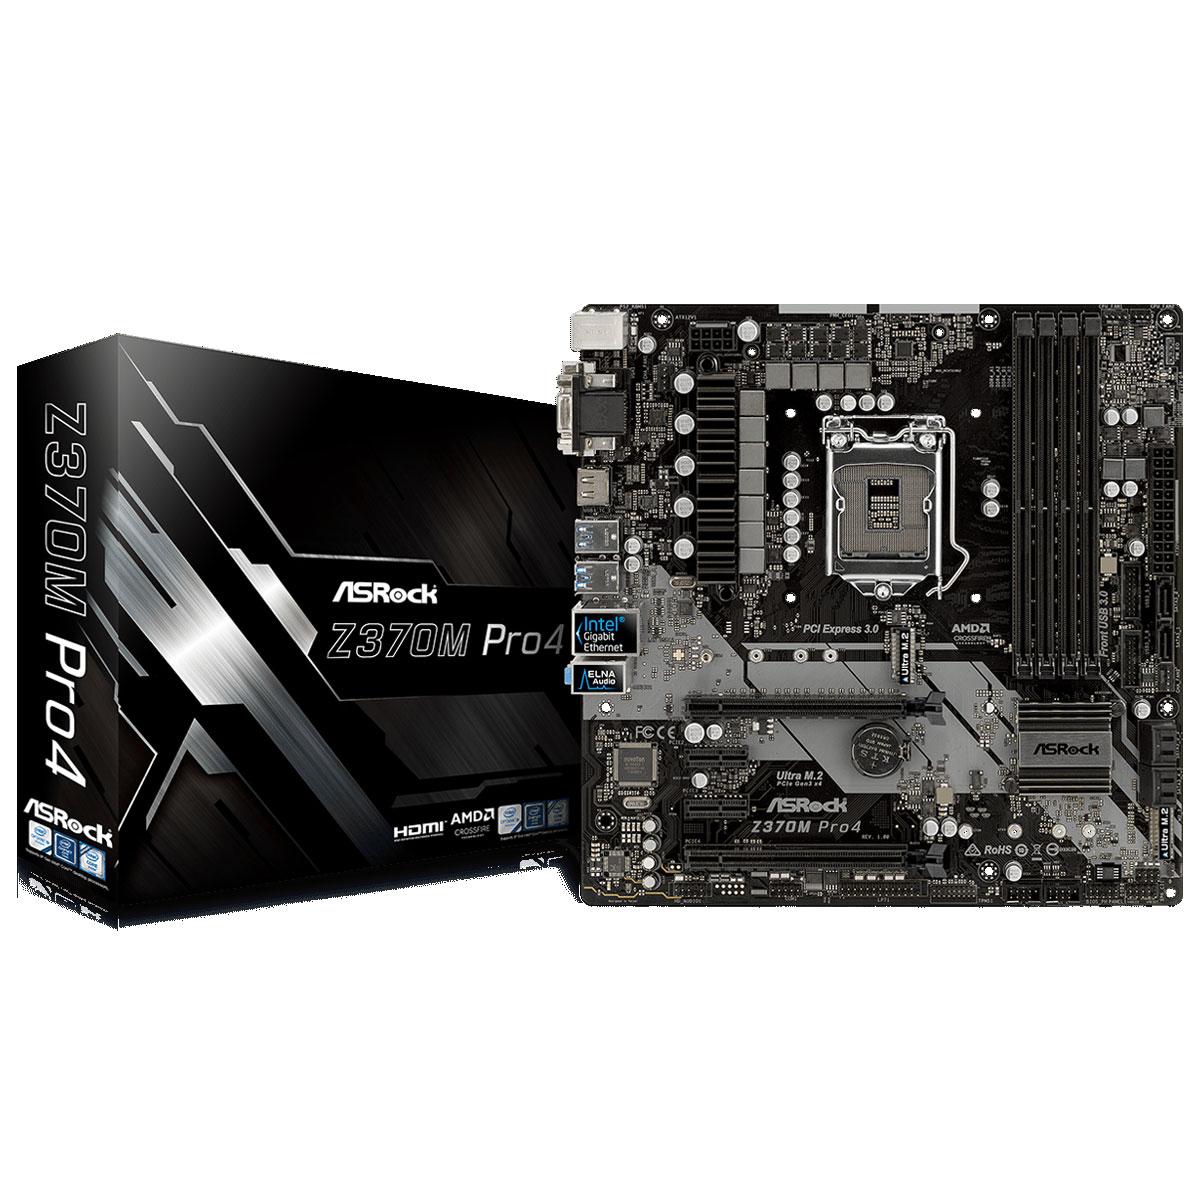 Carte mère ASRock Z370M PRO4 Carte mère Micro ATX Socket 1151 Intel Z370 Express - 4x DDR4 - SATA 6Gb/s + M.2 - USB 3.1 - 2x PCI-Express 3.0 16x